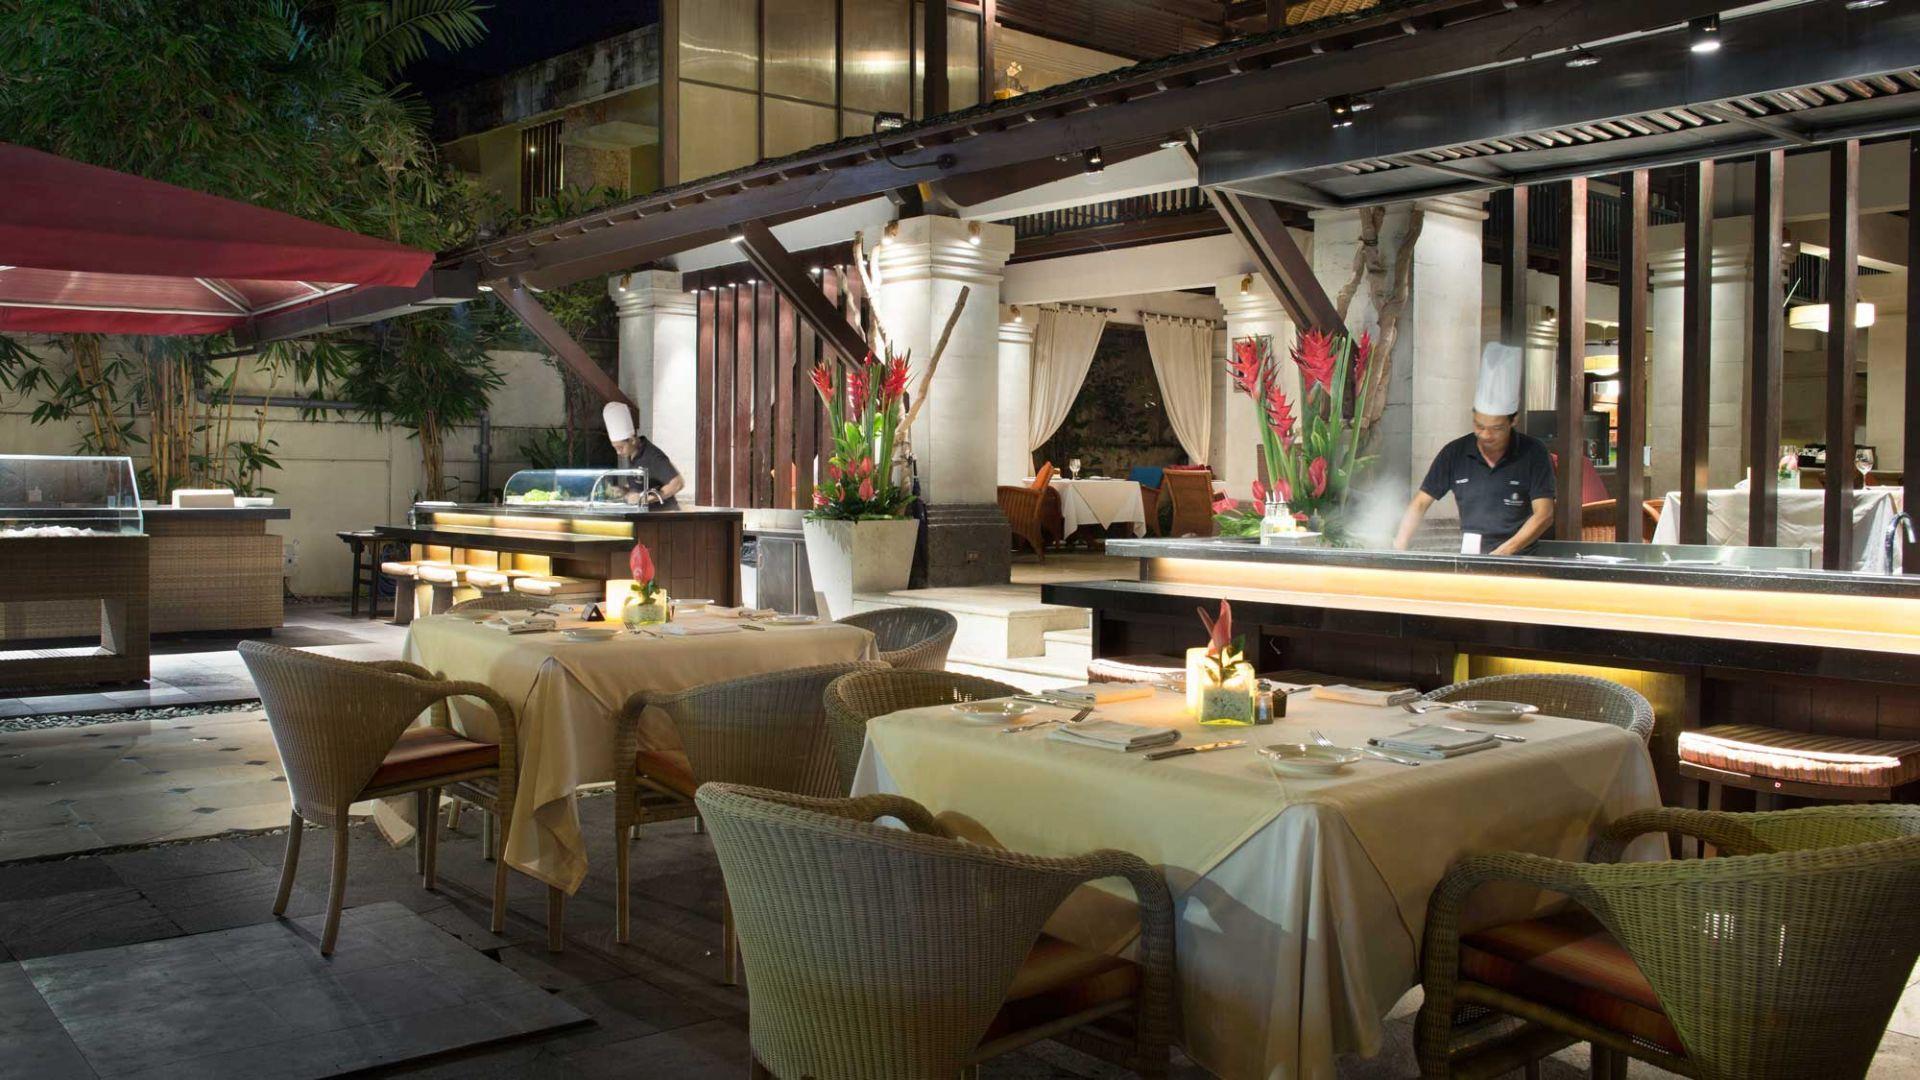 Mezzanine Thai Kitchen & Bar